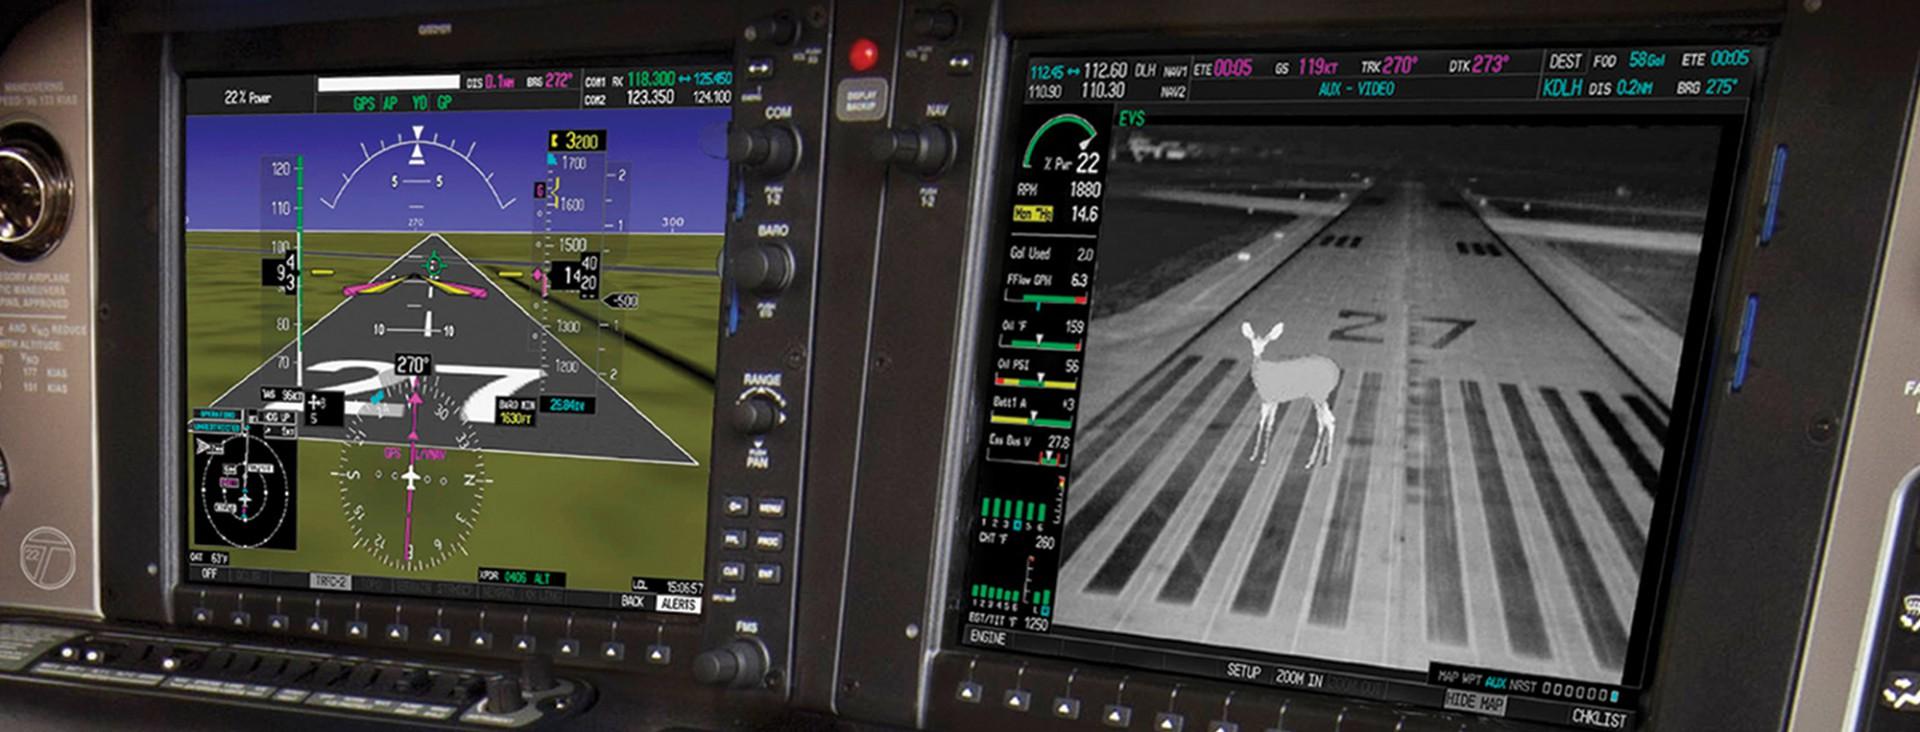 Enhanced Vision System Cirrus Aircraft